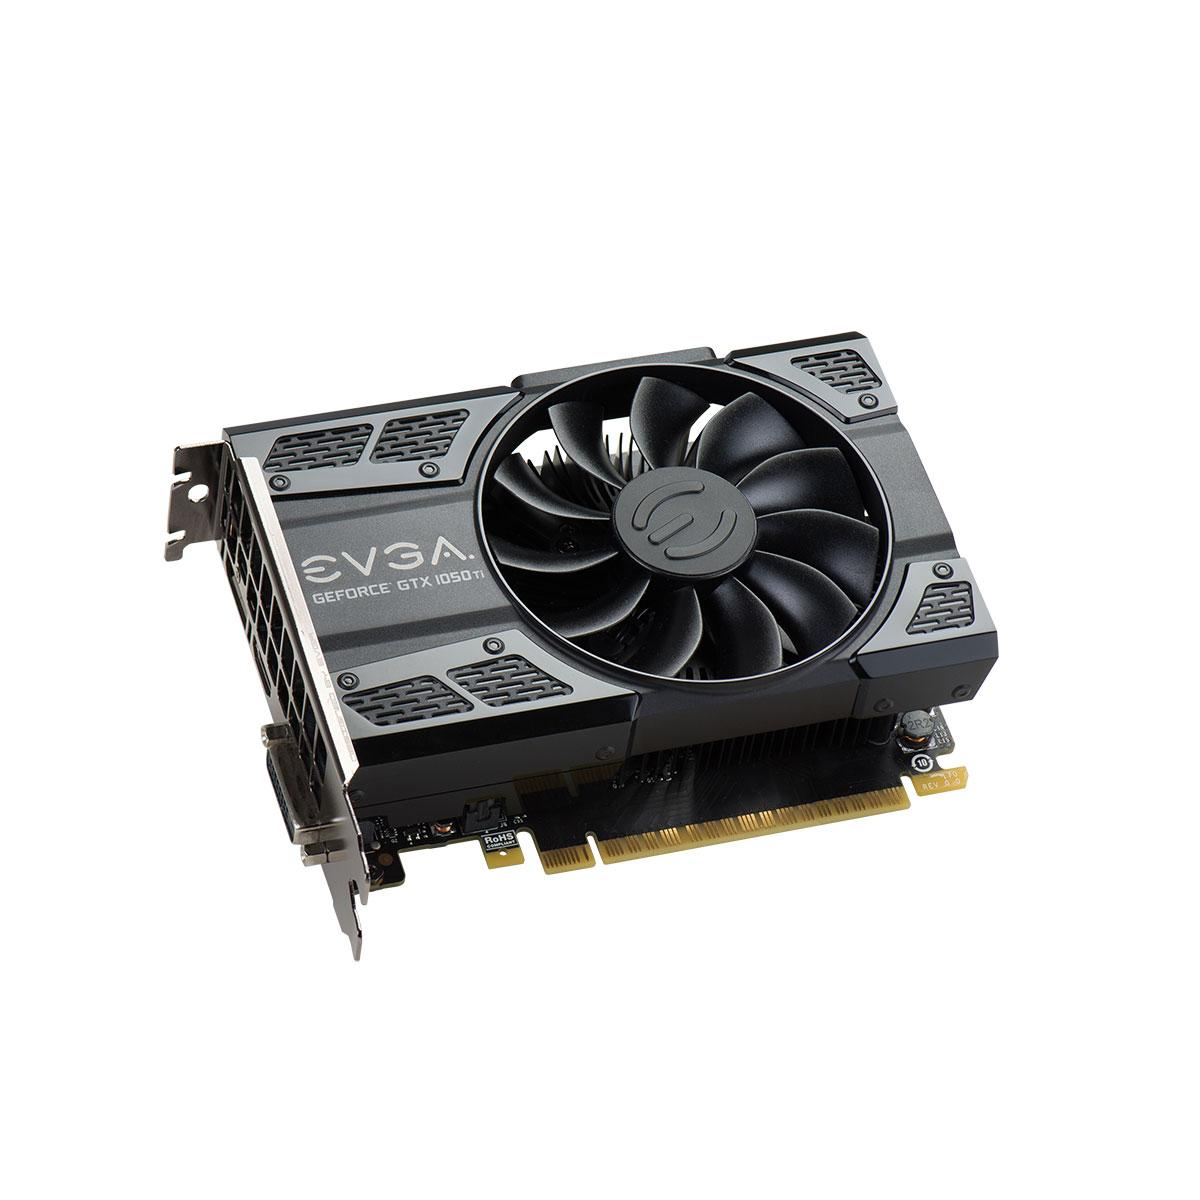 Видео карта  EVGA GeForce GTX 1050 Ti SC GAMING 04G-P4-6253-KR, 4GB, GDDR5, 128 bit, DVI-D, DisplayPort, HDMI